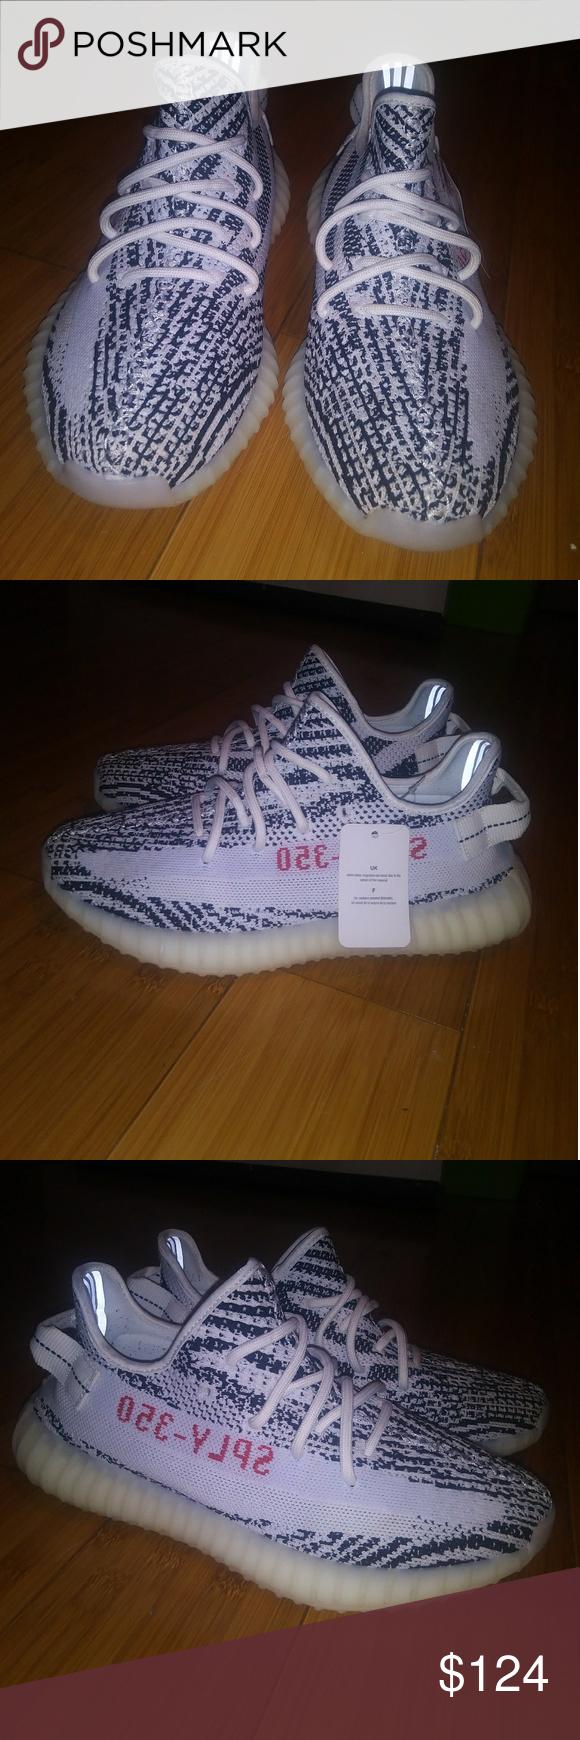 adidas nmd mens r1 grey adidas yeezy zebra box tag css